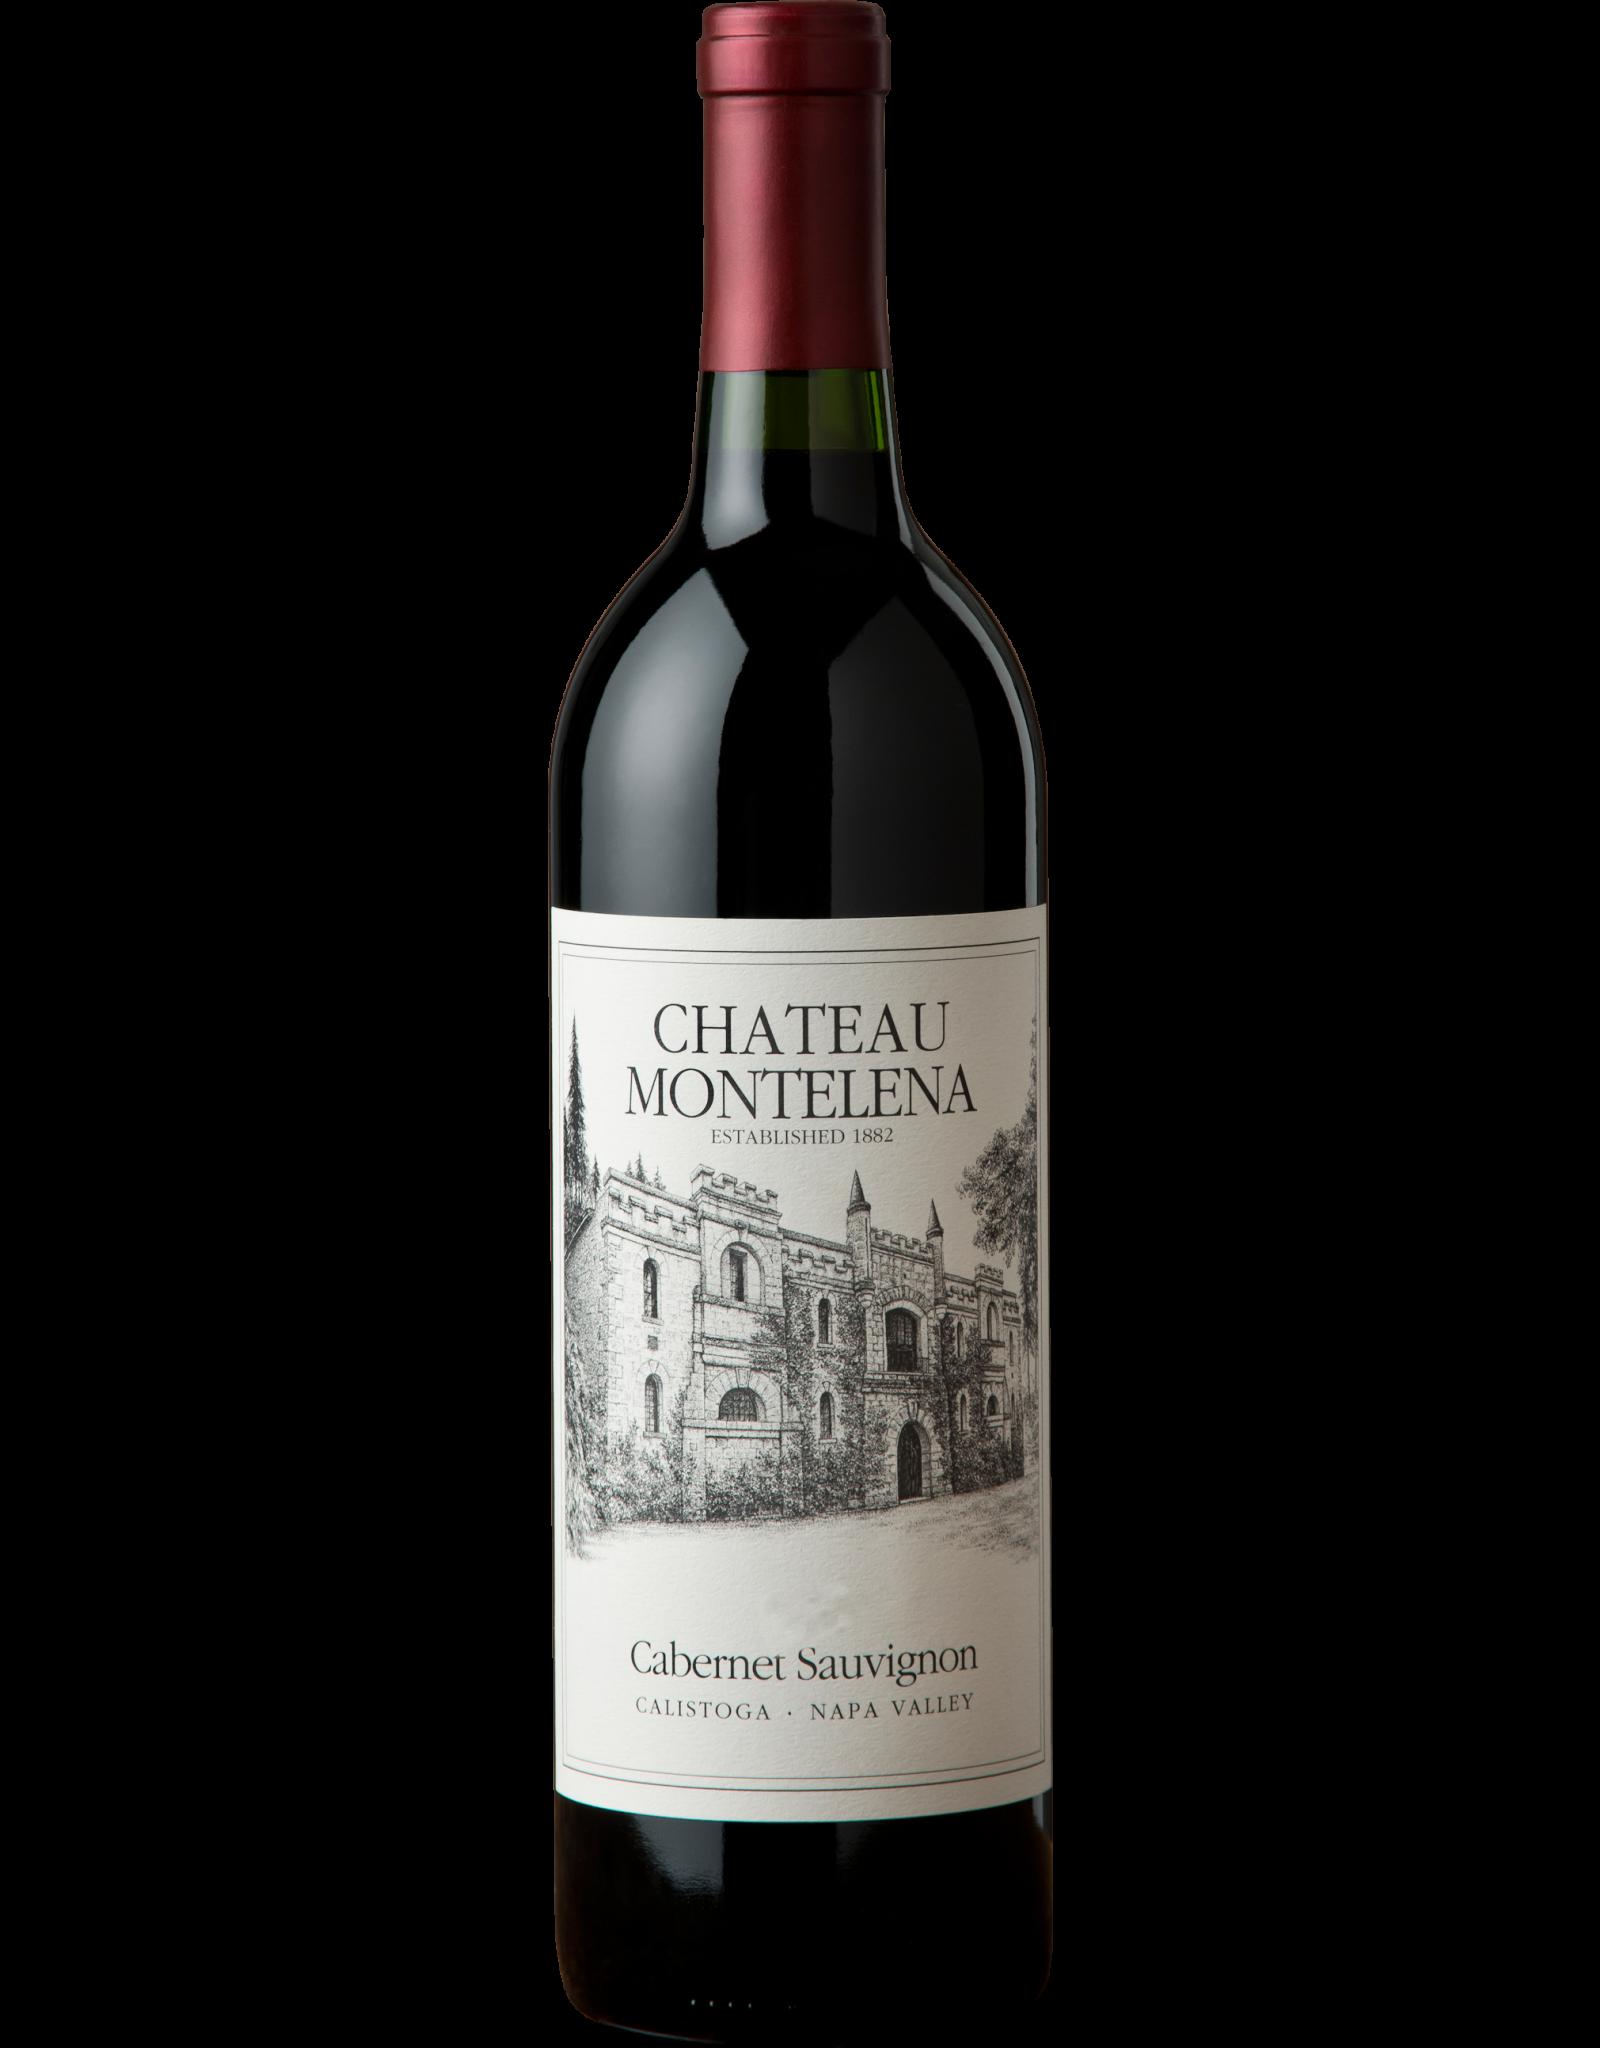 Chateau Montelena Napa Valley Cabernet Sauvignon 2018